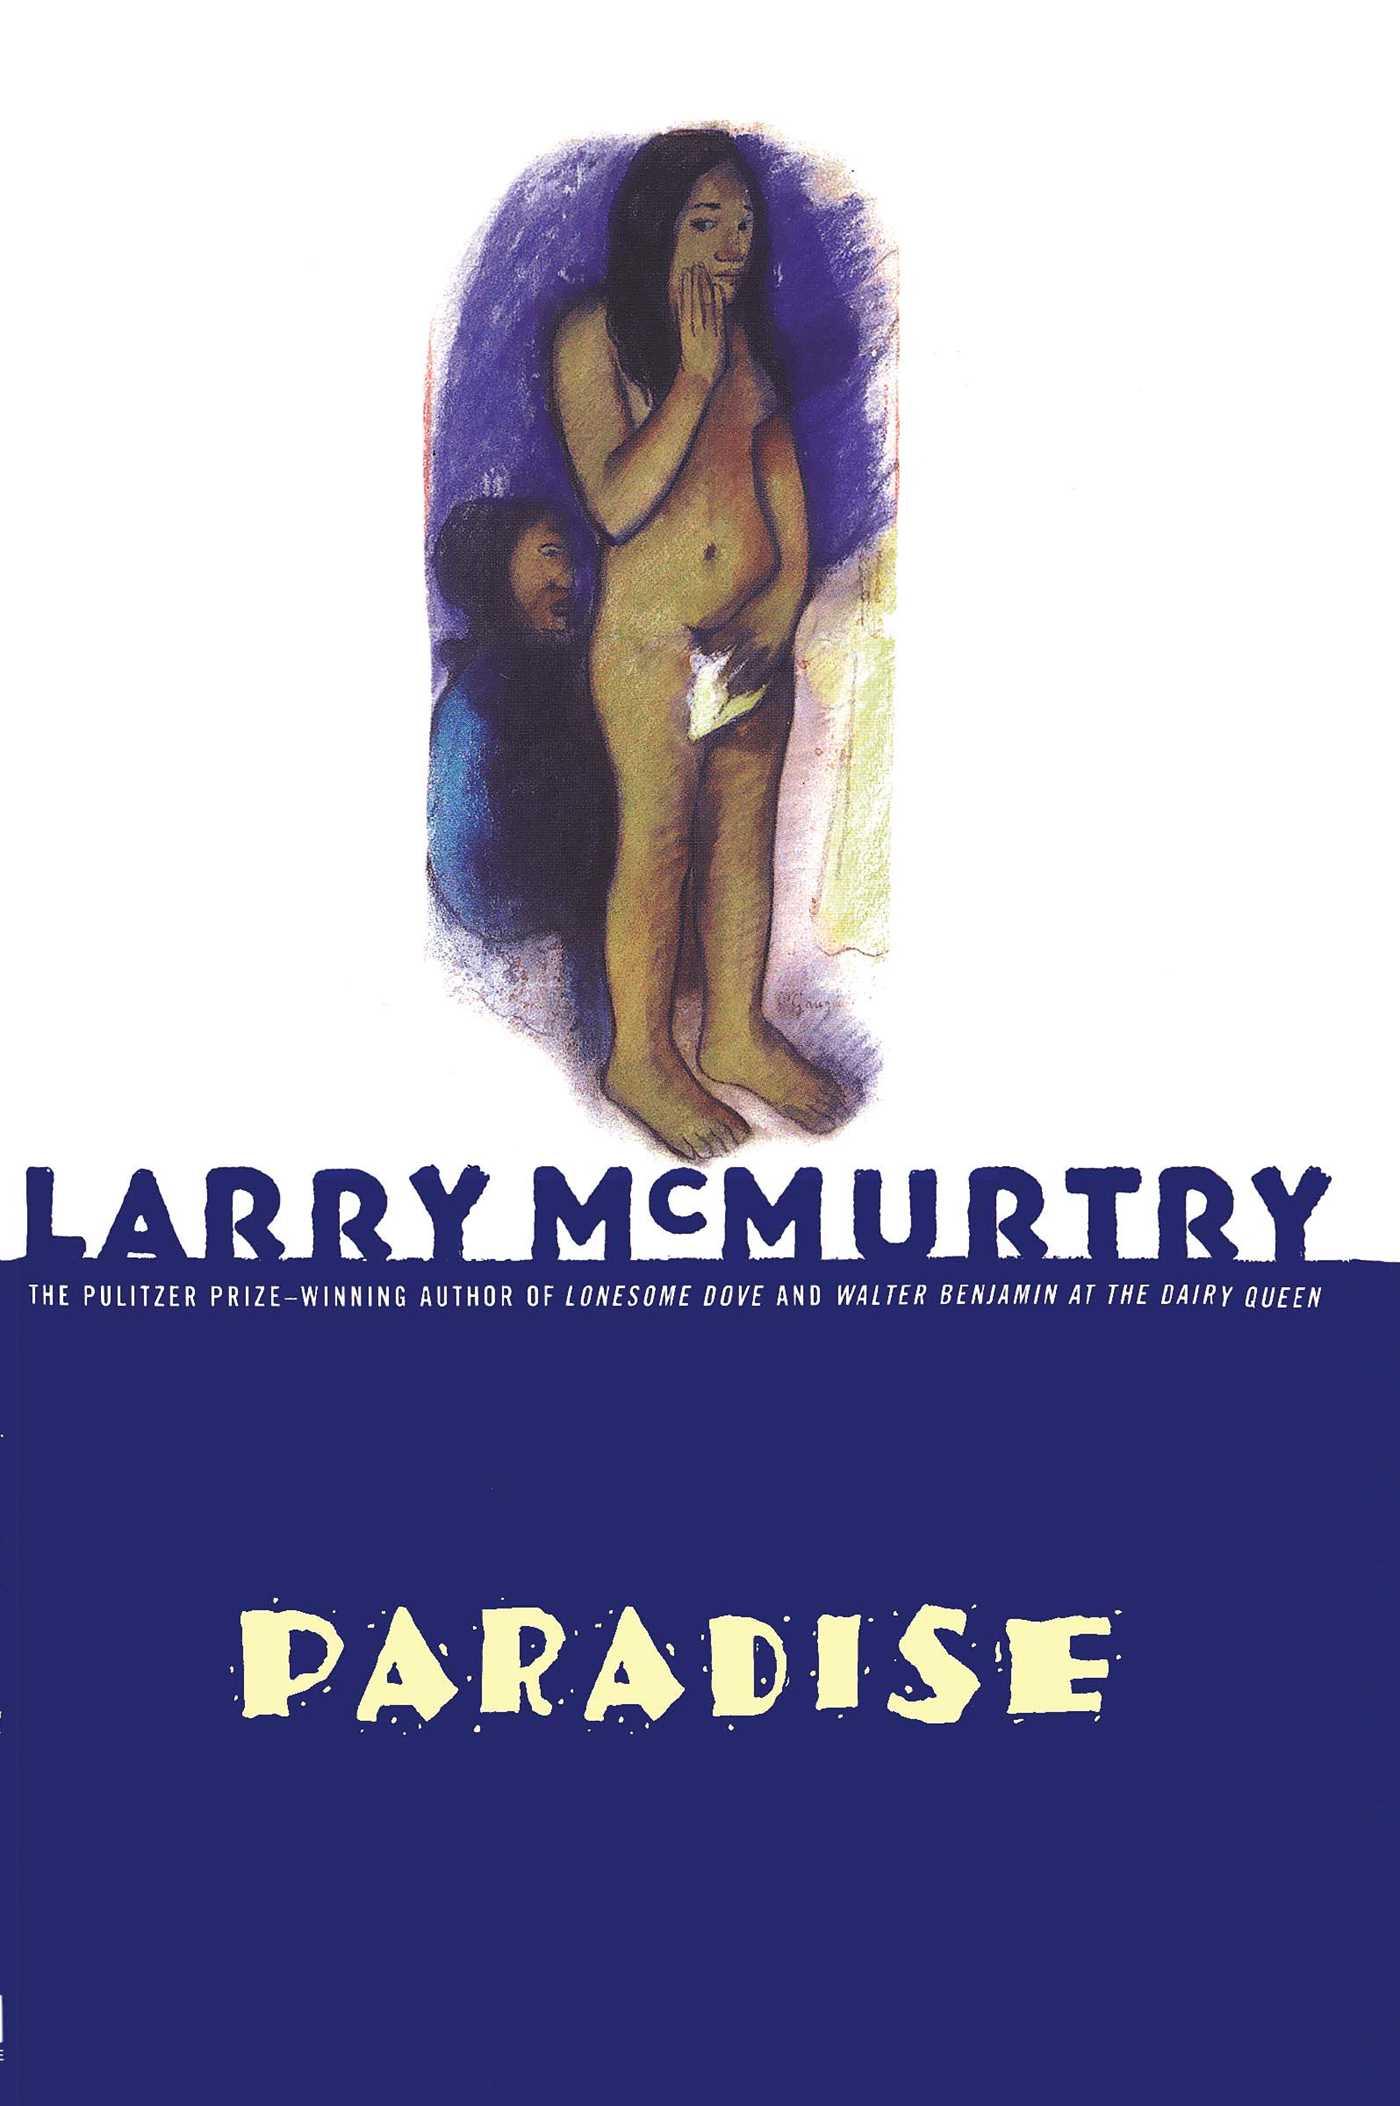 Paradise 9780743215664 hr